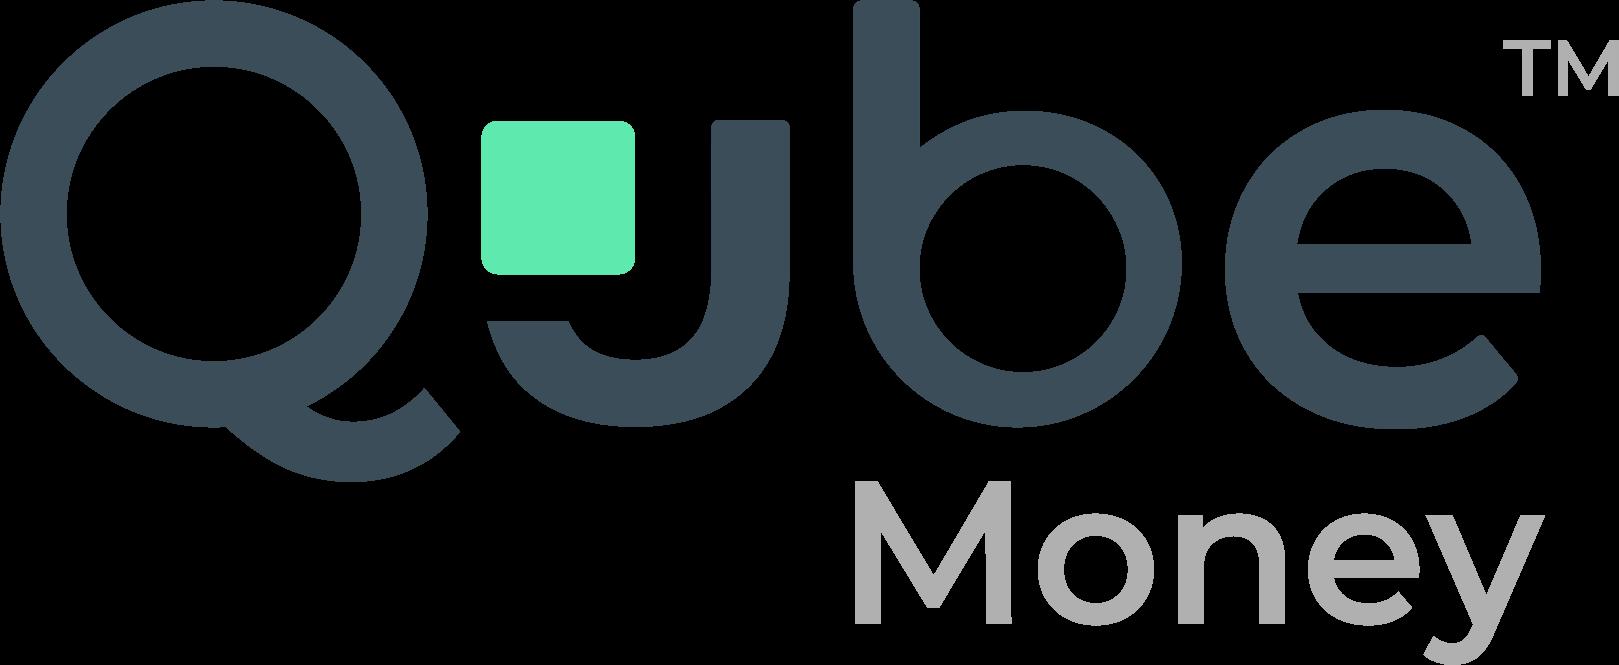 Qube Money | Banking & Budgeting